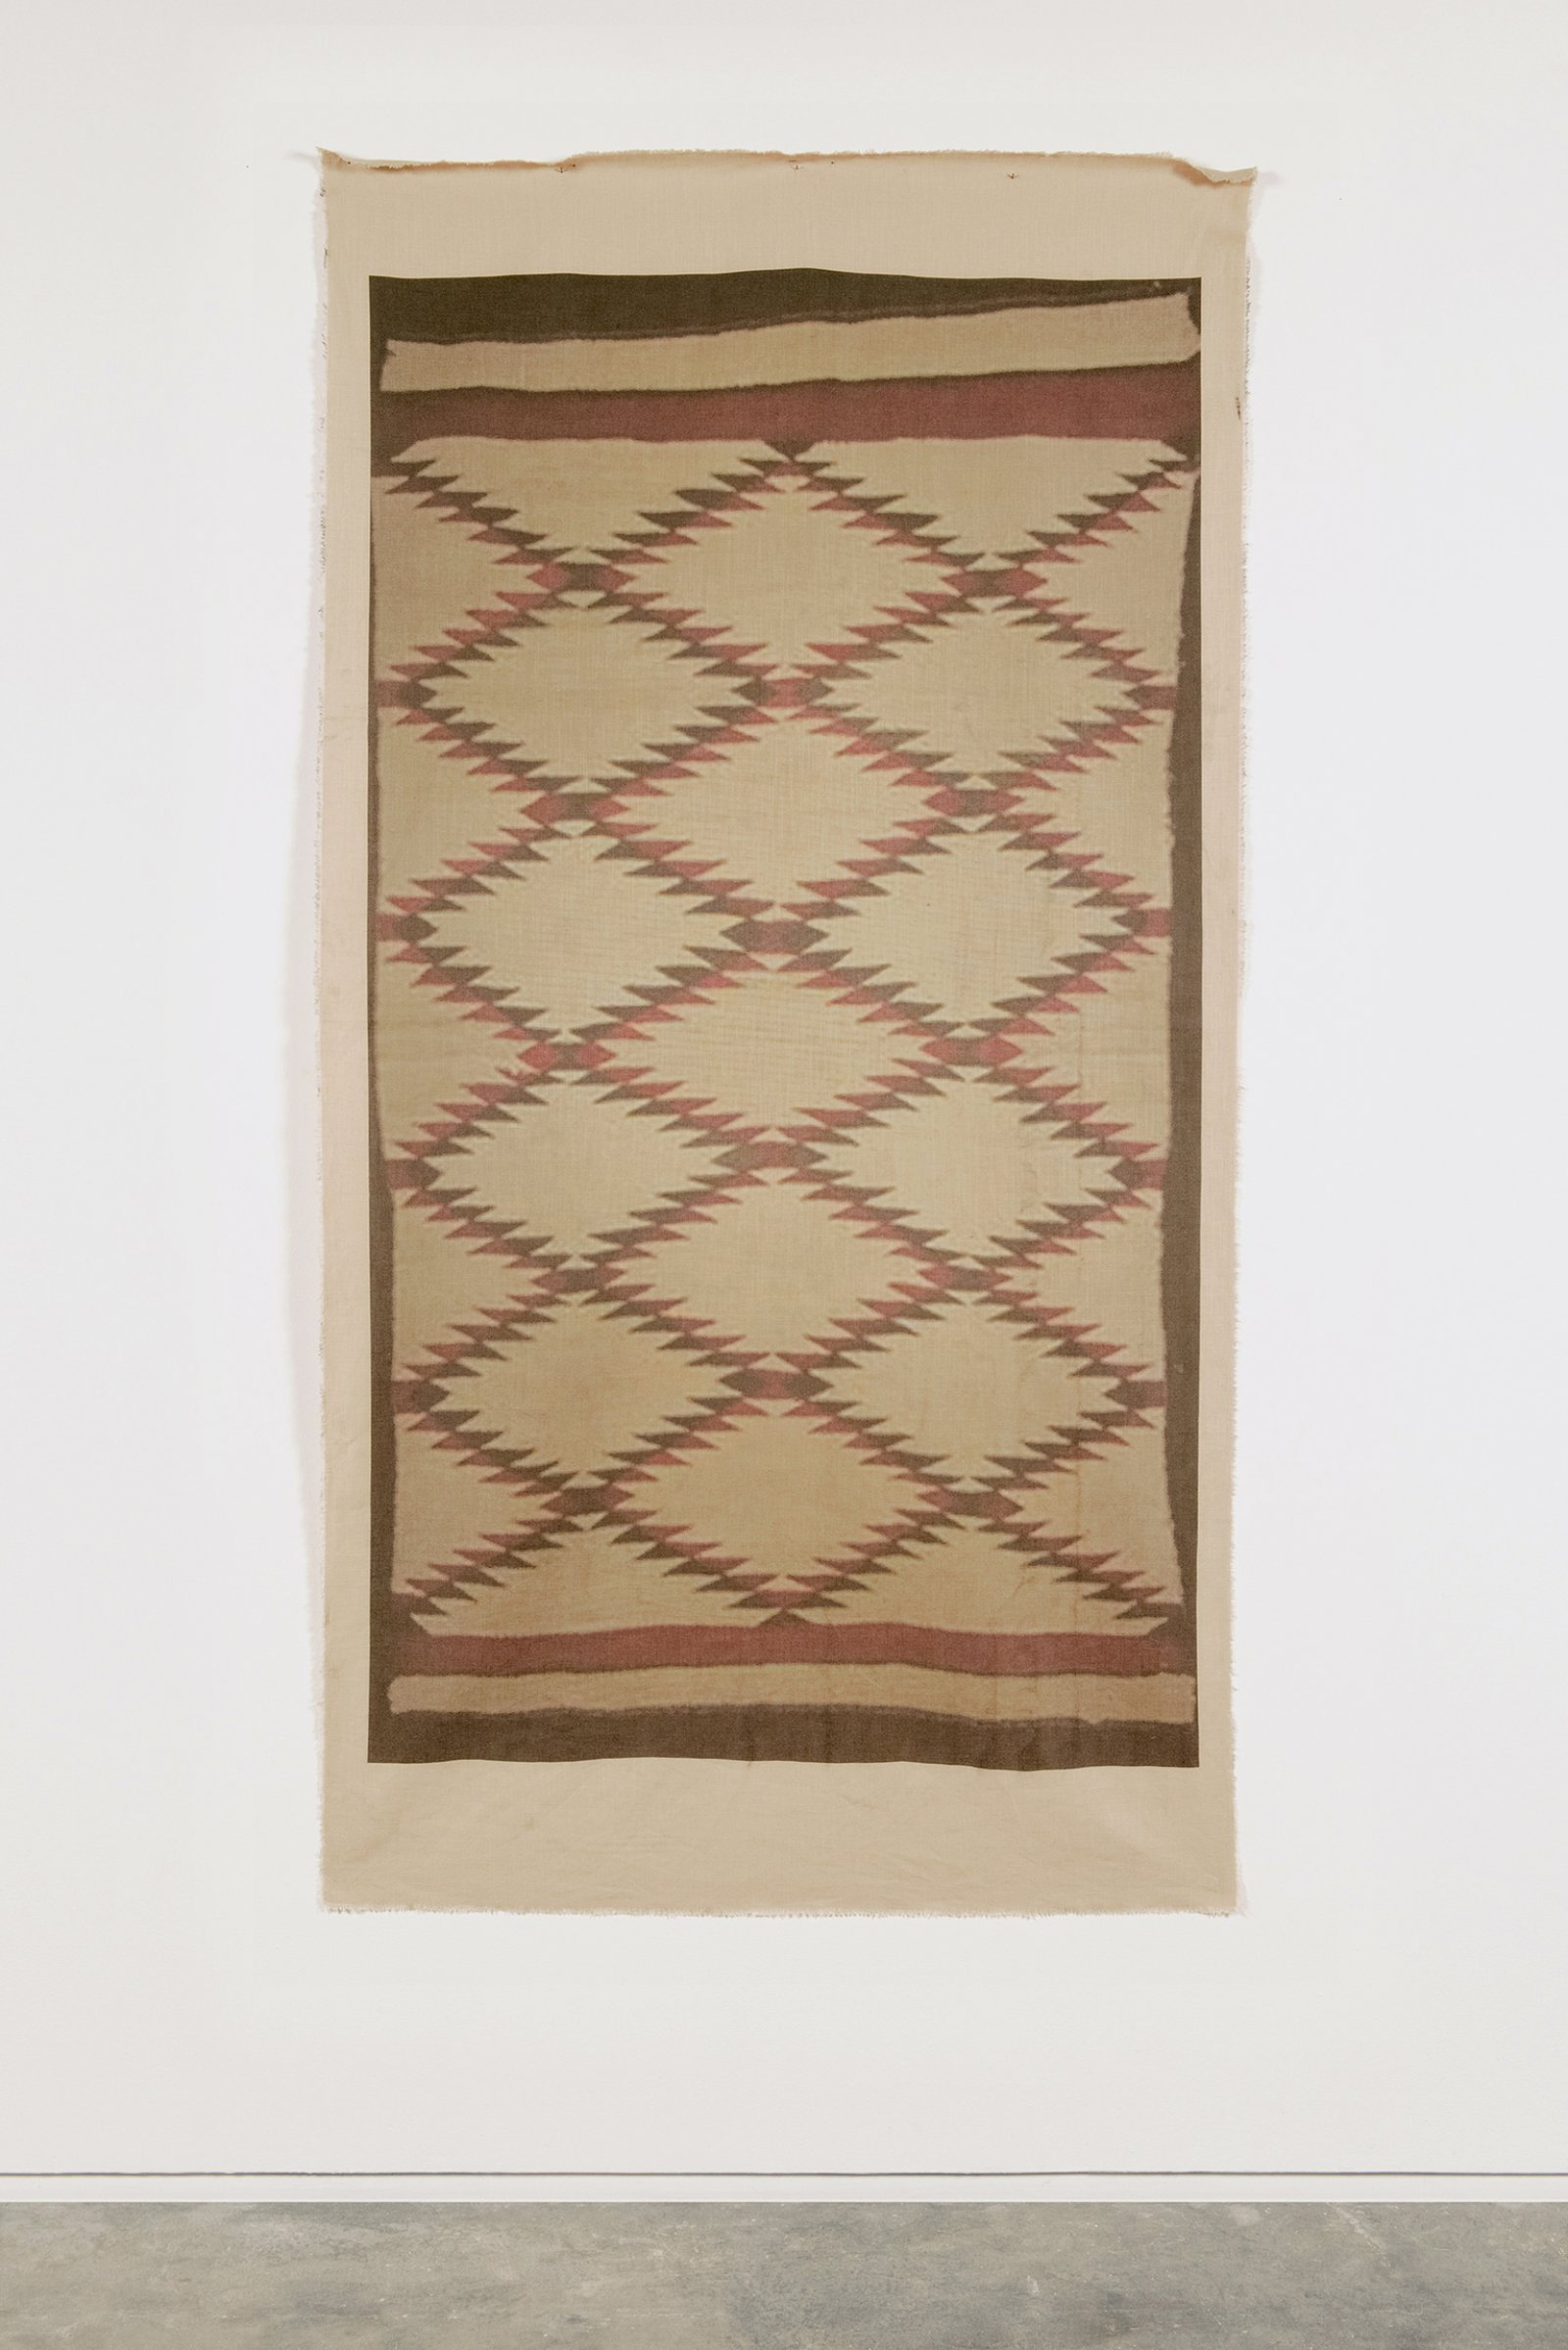 Duane Linklater,UMFA 1993.005.001, 2015, inkjet print on linen, nails, from Navajo Serape, Utah Museum of Fine Arts Collection, 85 x 44 in. (216 x 112 cm)